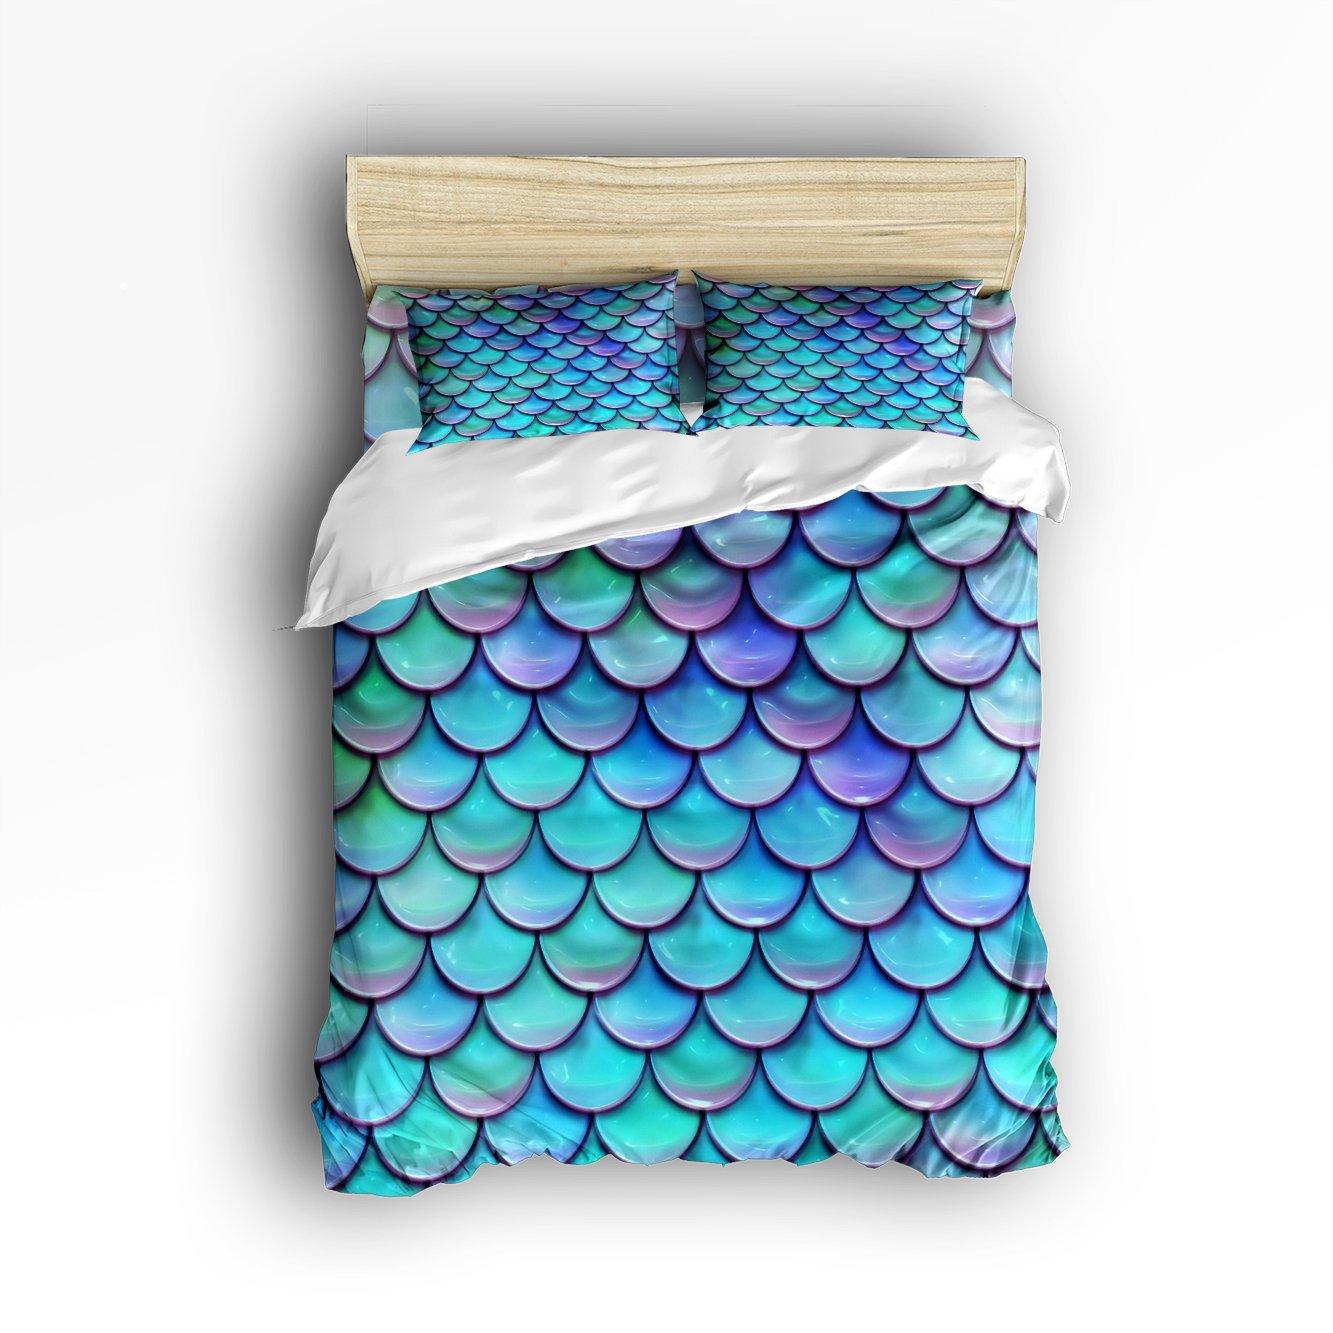 Queen Size Bedding Set- Fish Scales Purple Blue Duvet Cover Set Bedspread for Childrens/Kids/Teens/Adults, 4 Piece 100 % Cotton